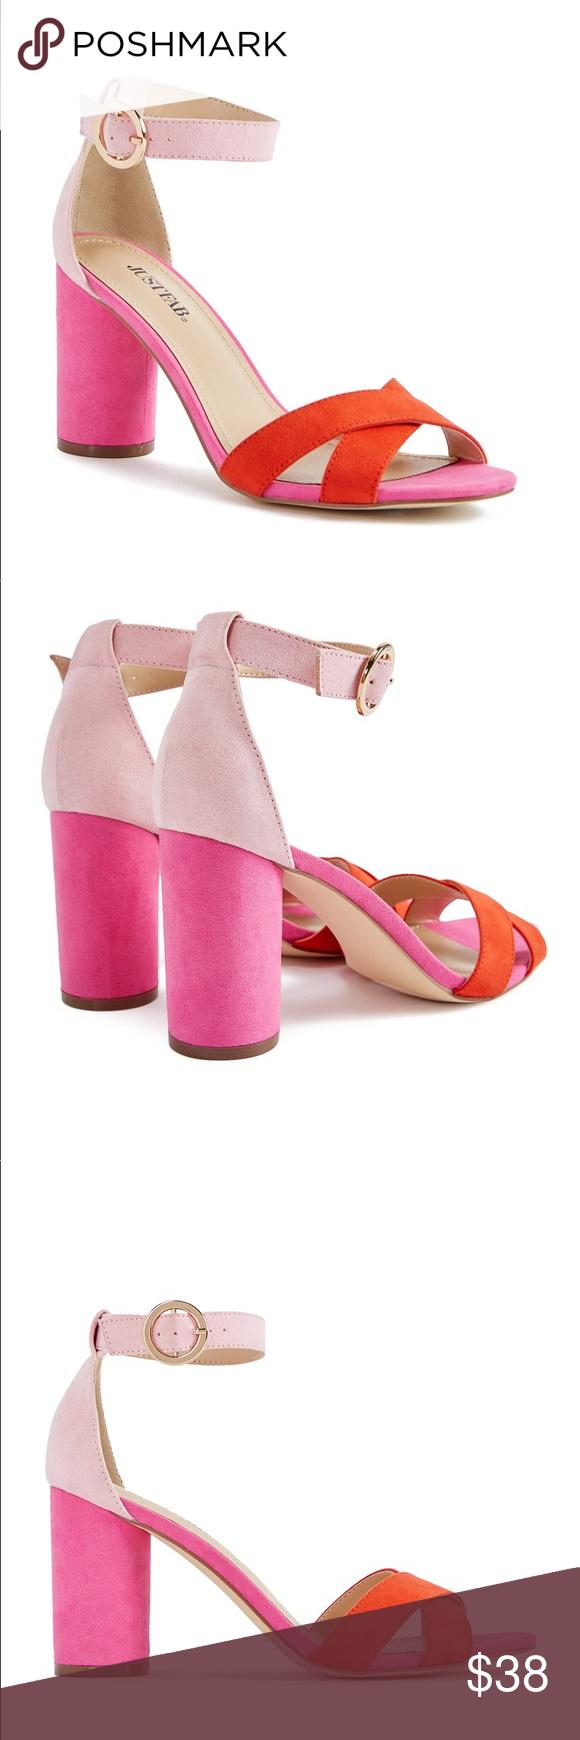 Brand new pink red block heels in My Posh Picks Pinterest